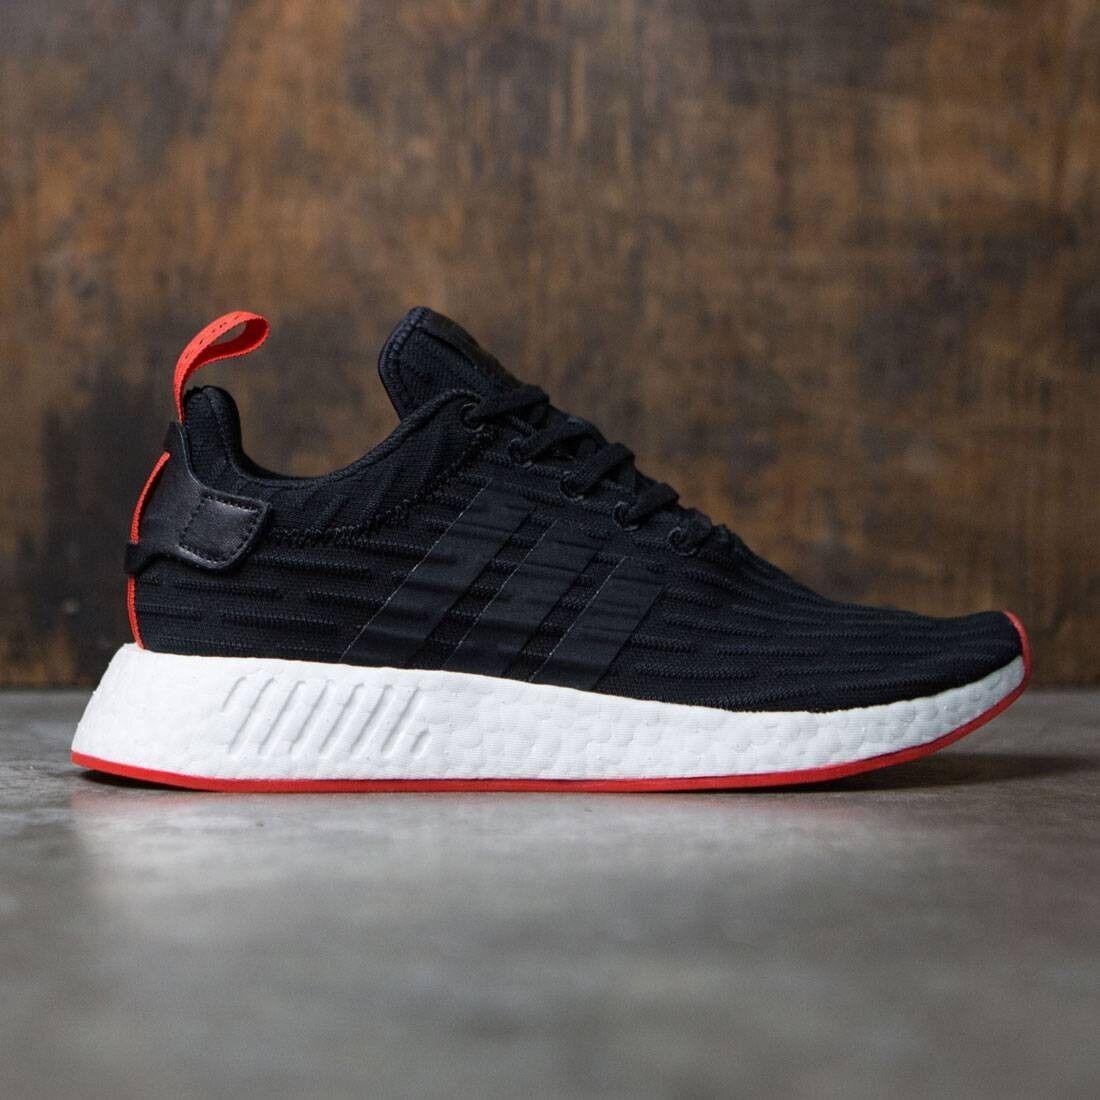 Adidas NMD R2 PK Primeknit Black Red Size 10. BA7252 yeezy ultra boost